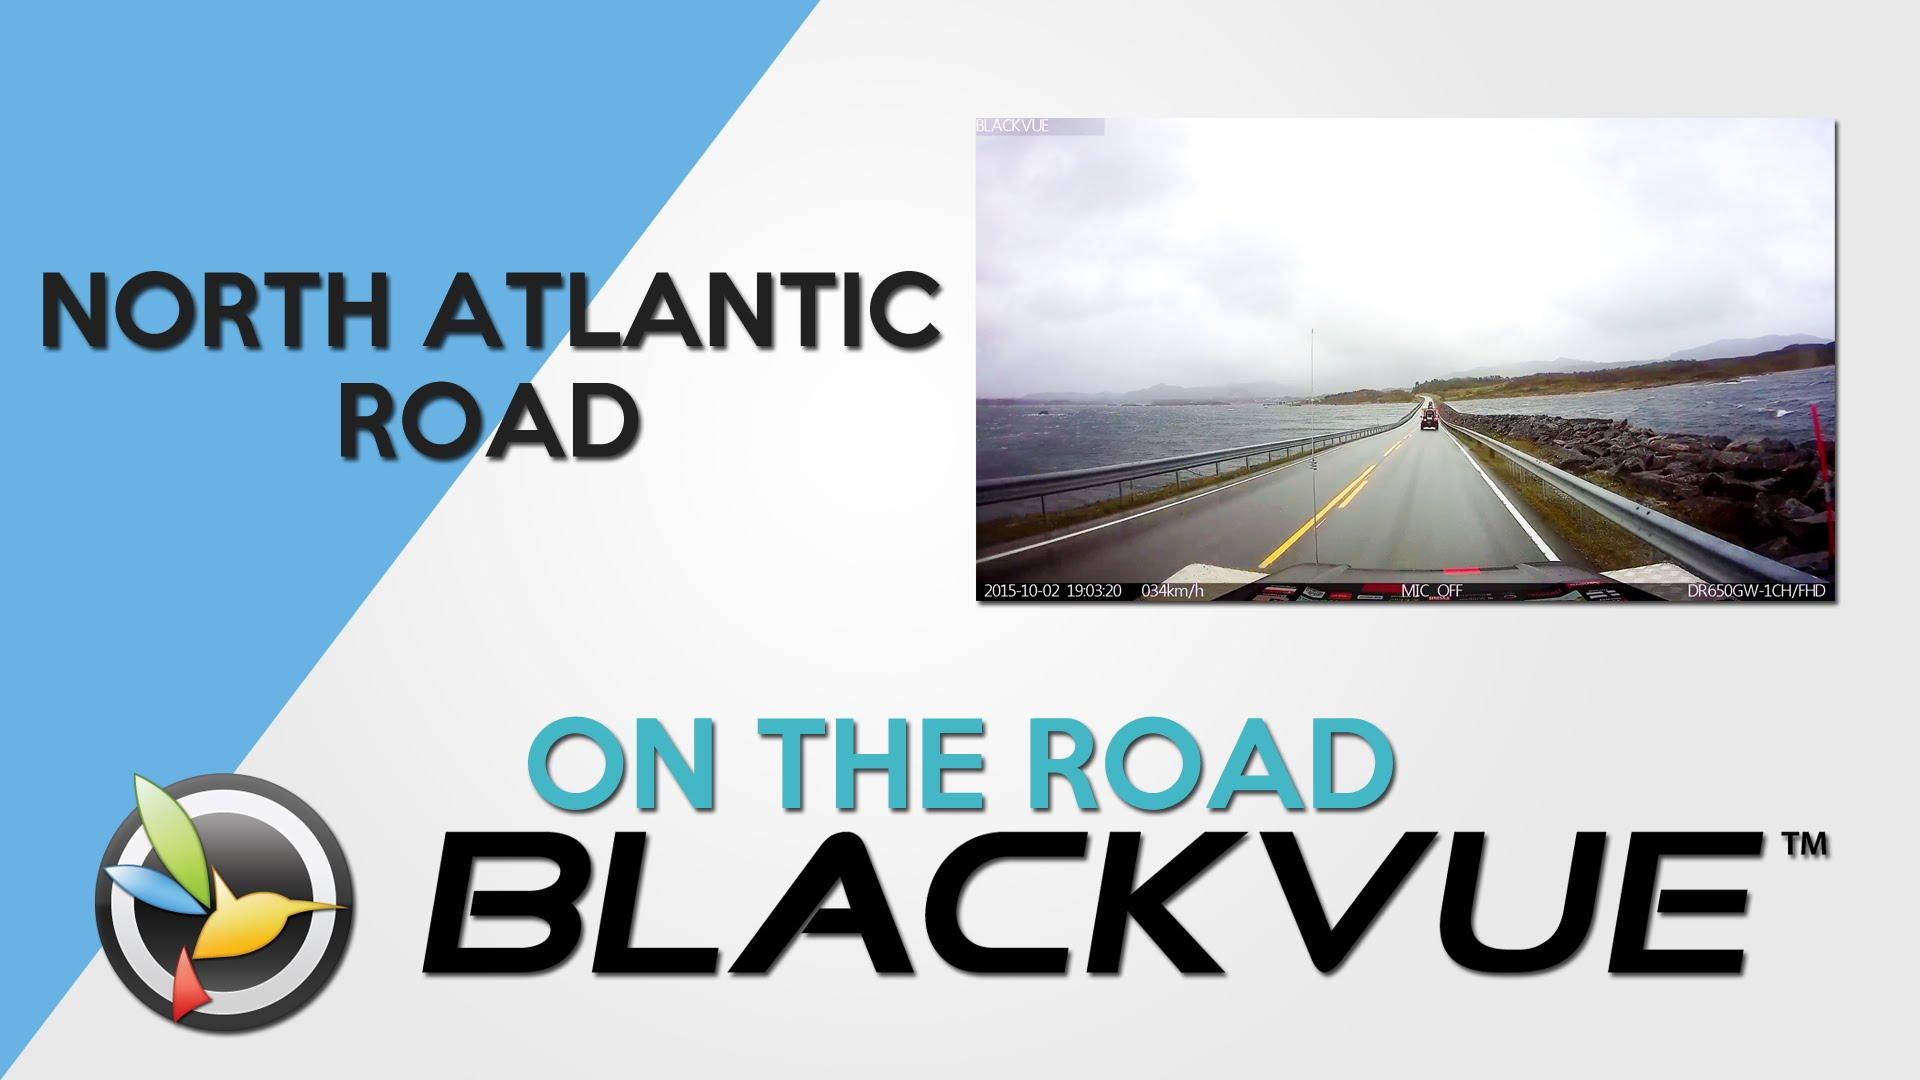 BLACKVUE ON THE ROAD: North Atlantic Road